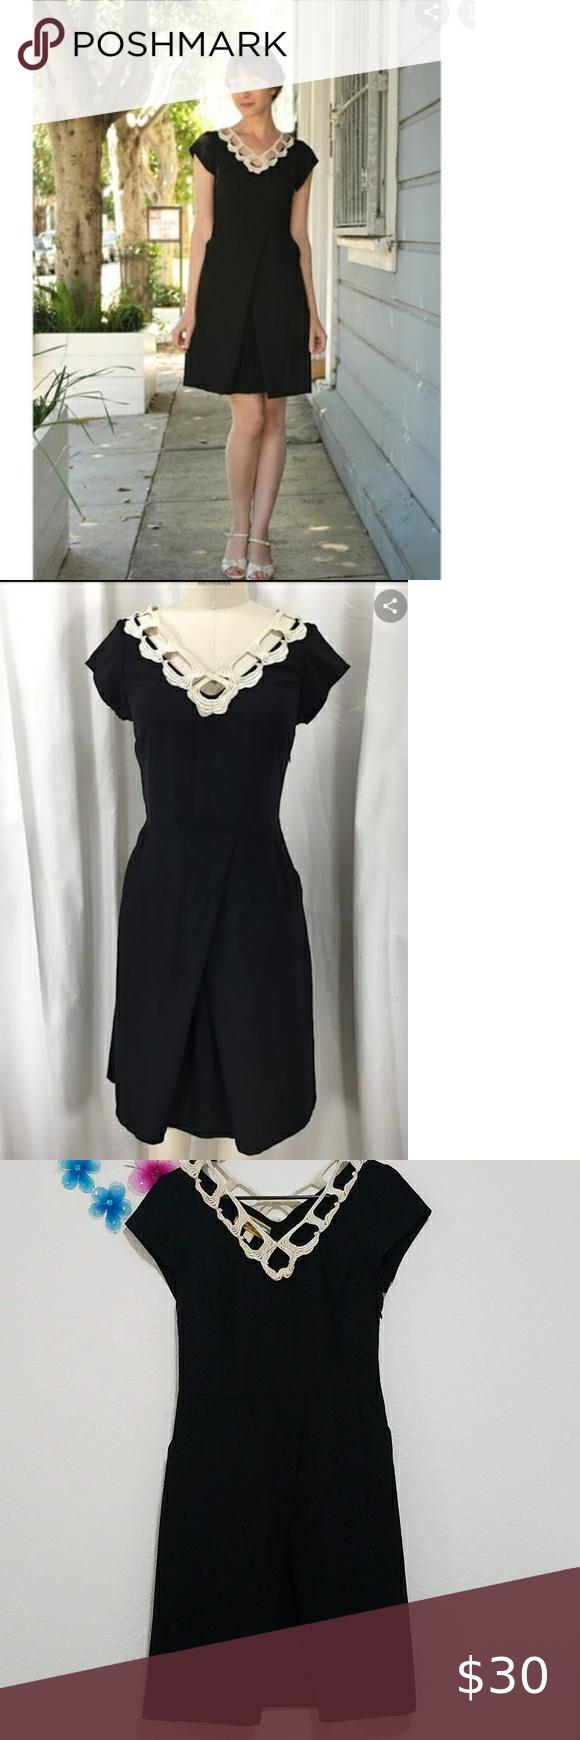 Hp Libertine For Target Vintage Black Dress Sz 9 Vintage Black Dress Black Dress Odd Molly Dress [ 1740 x 580 Pixel ]